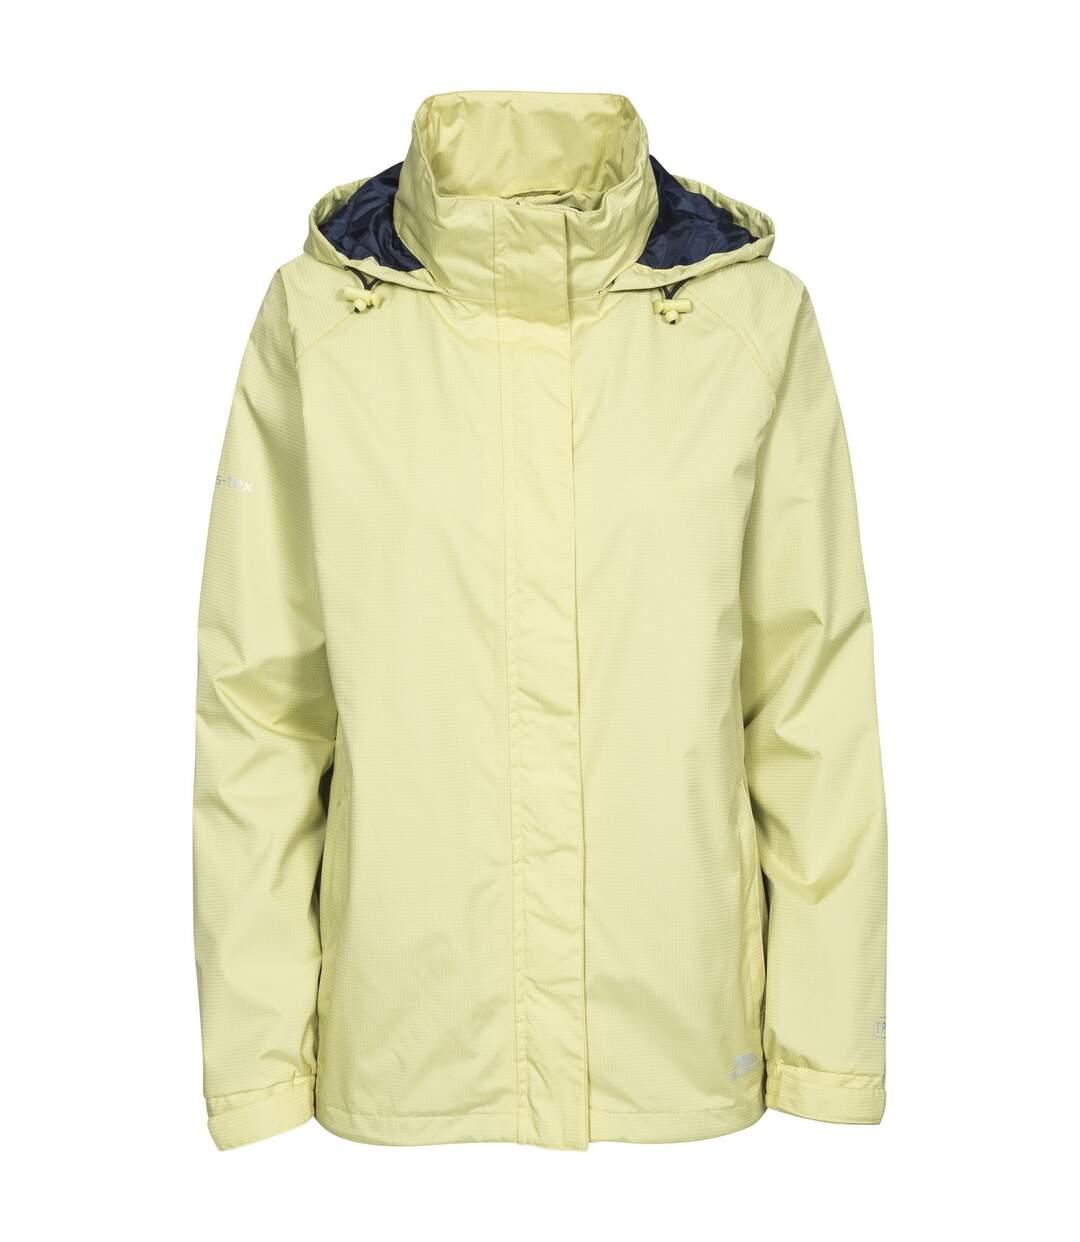 Trespass Womens/Ladies Lanna II Waterproof Jacket (Limelight) - UTTP3279